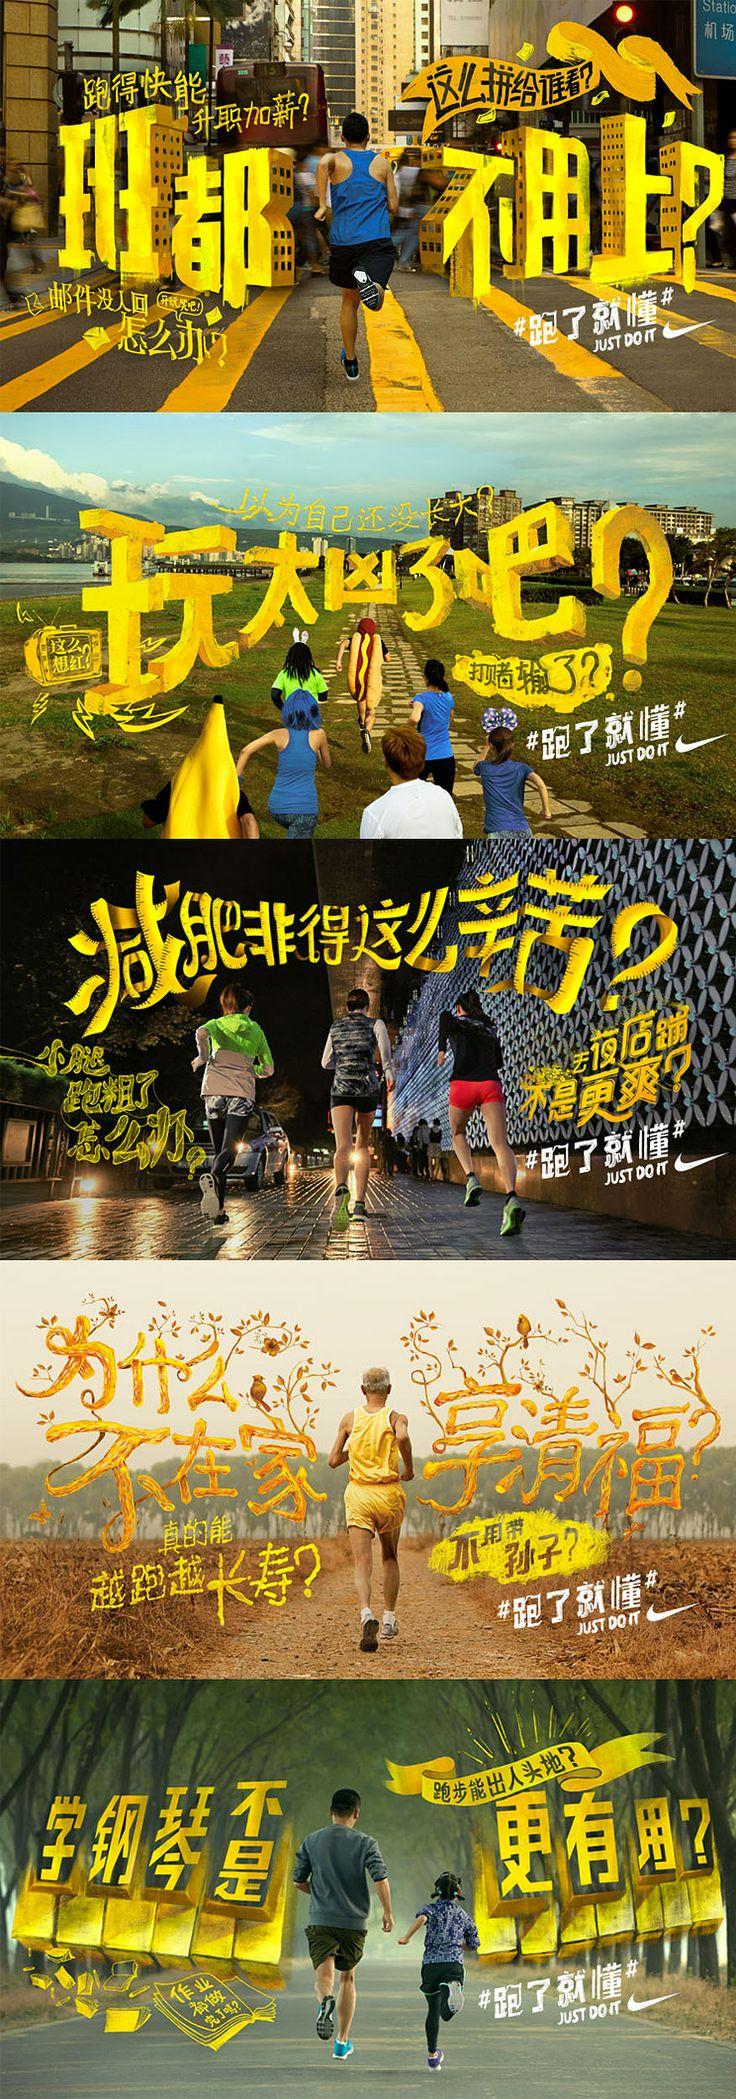 W+K Shanghai:耐克跑了就懂 - 即使不跑步的借口很多惰性很大这些跑者也坚定向前,'跑了就懂' 简单四个字带给人想要尝试的冲动。